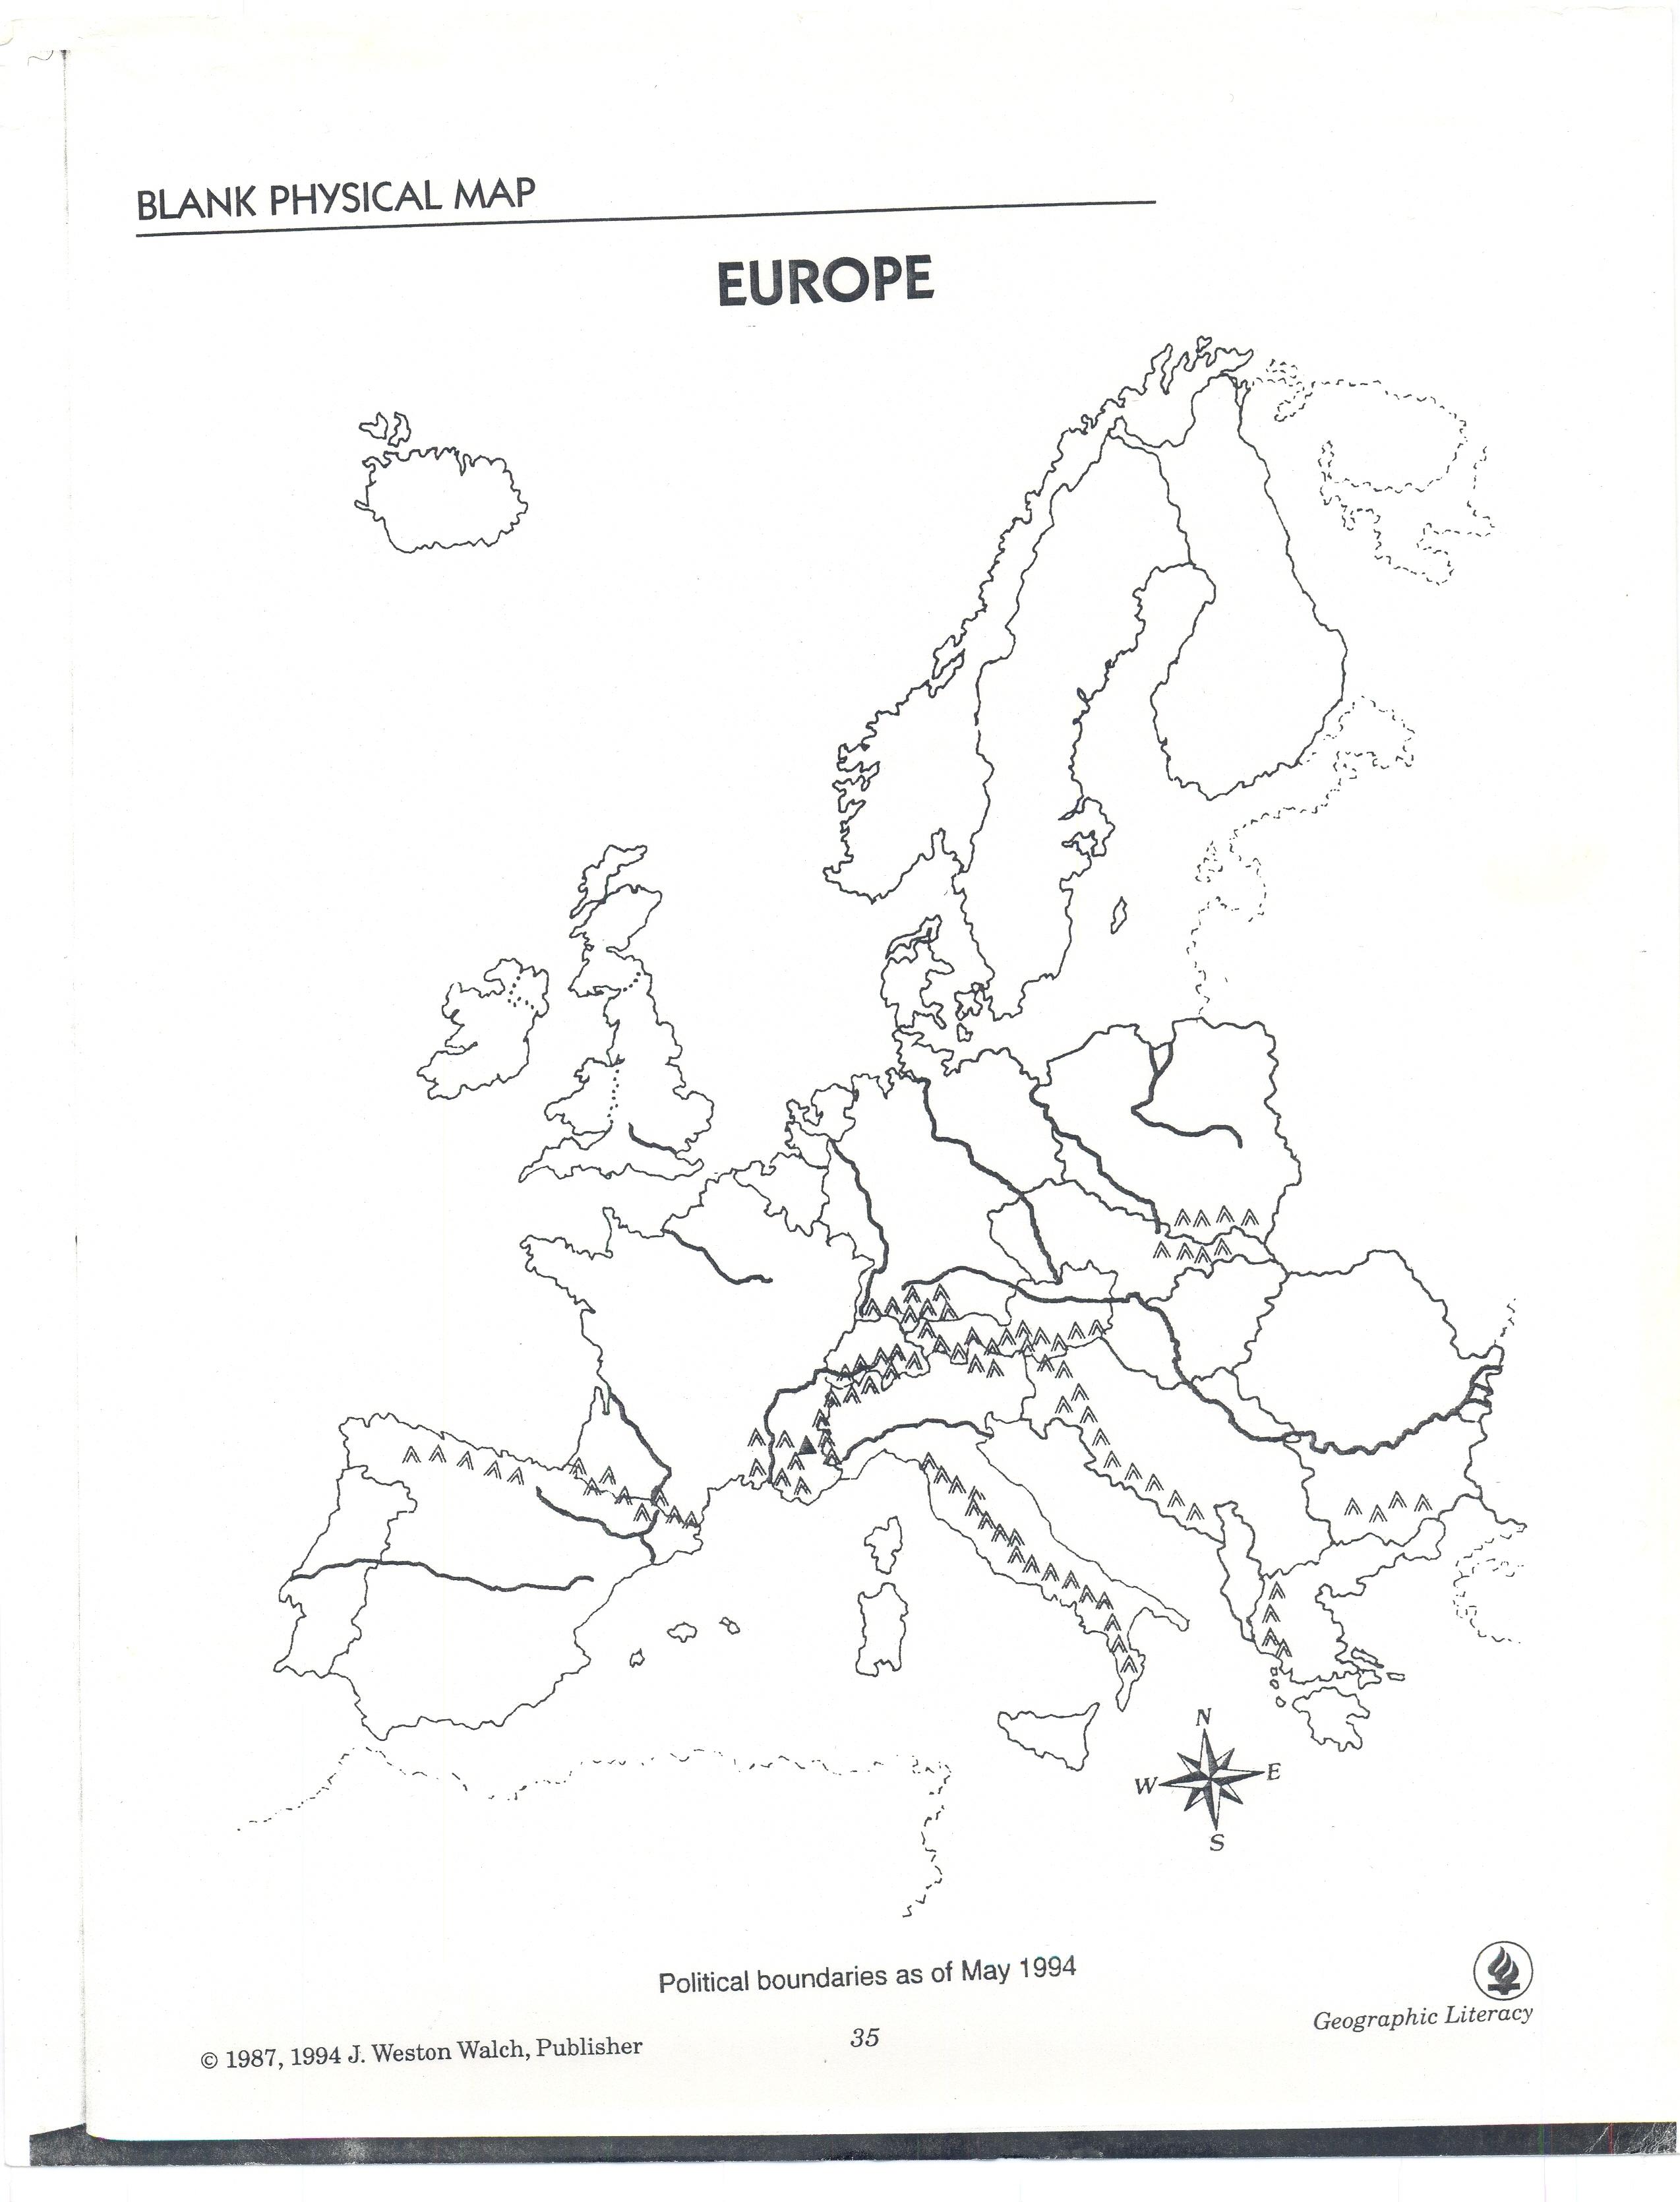 Dengel, Heather / Map Info.